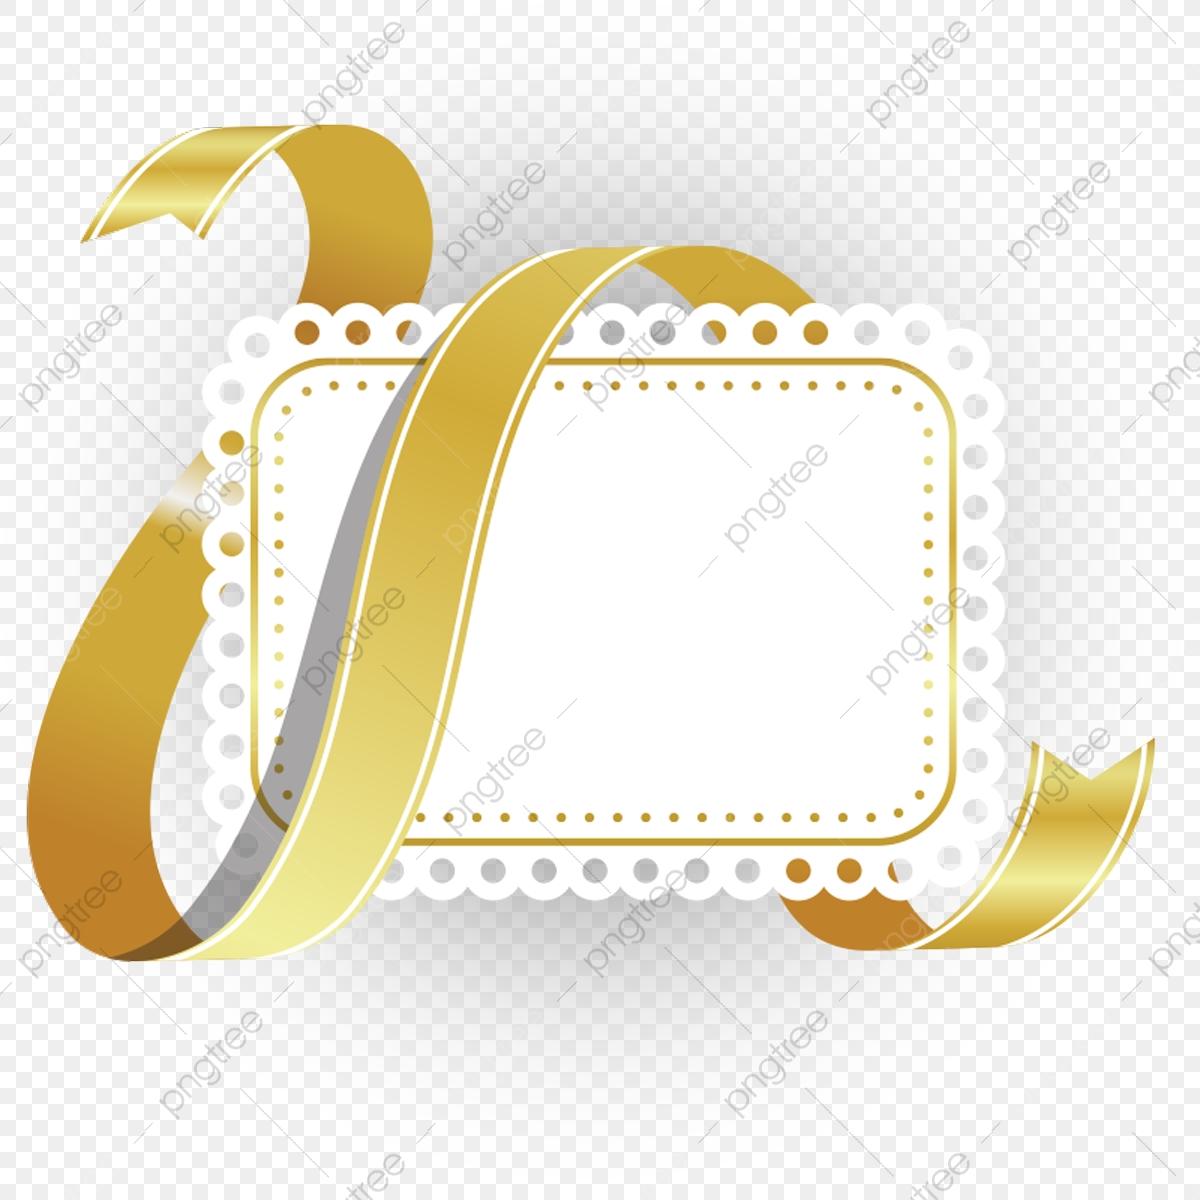 Golden Luxury Ribbon In Blank Banner, Golden, Luxury, Ribbon PNG.